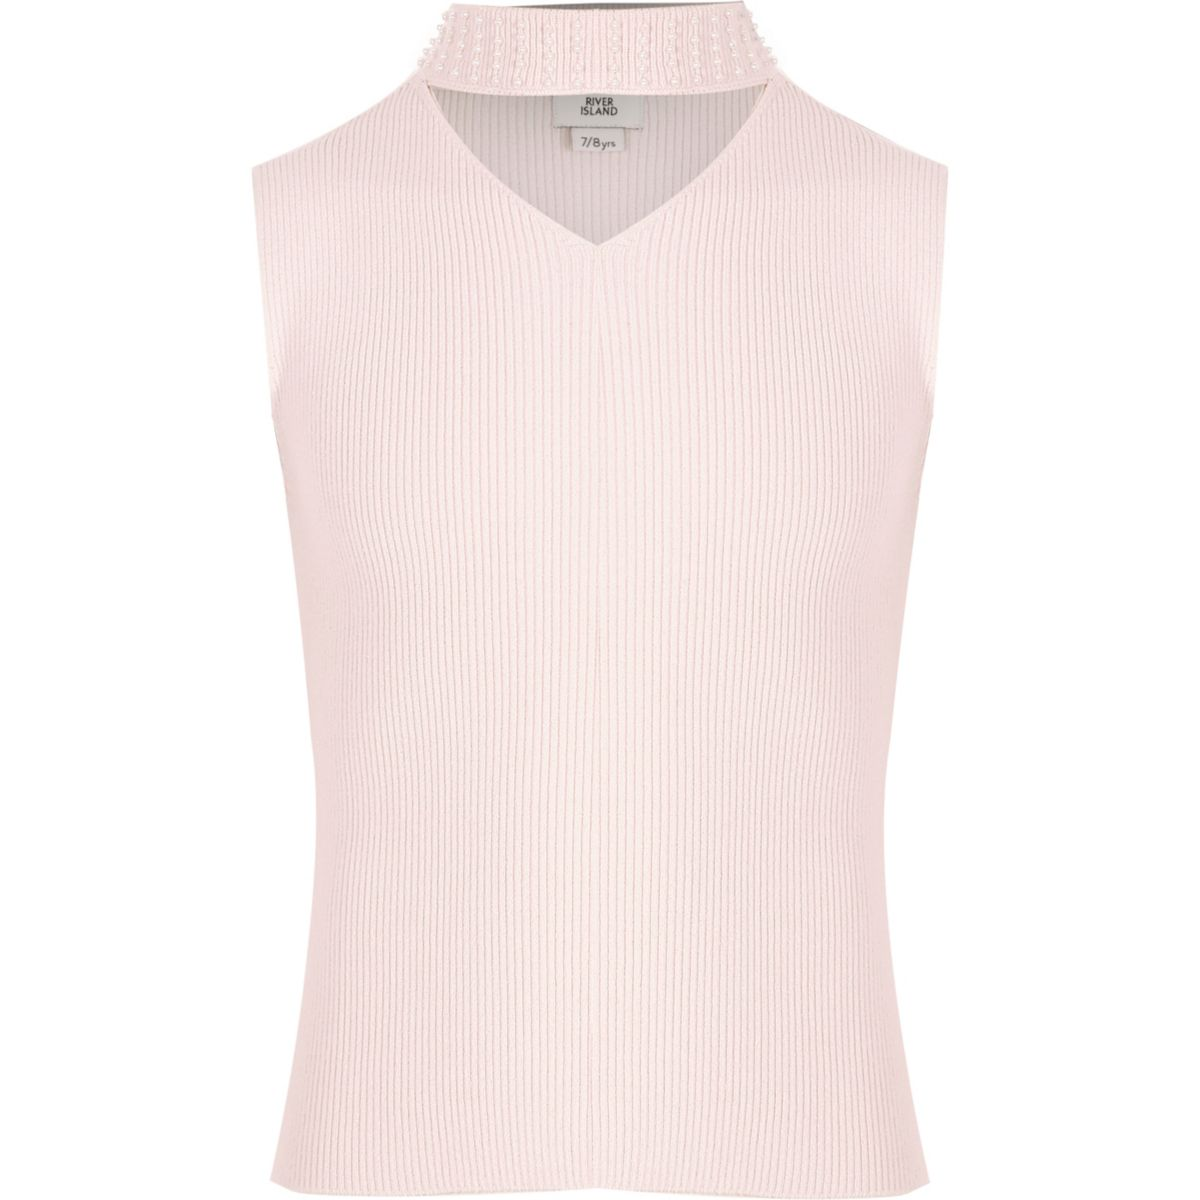 Girls pink rib knit embellished choker top